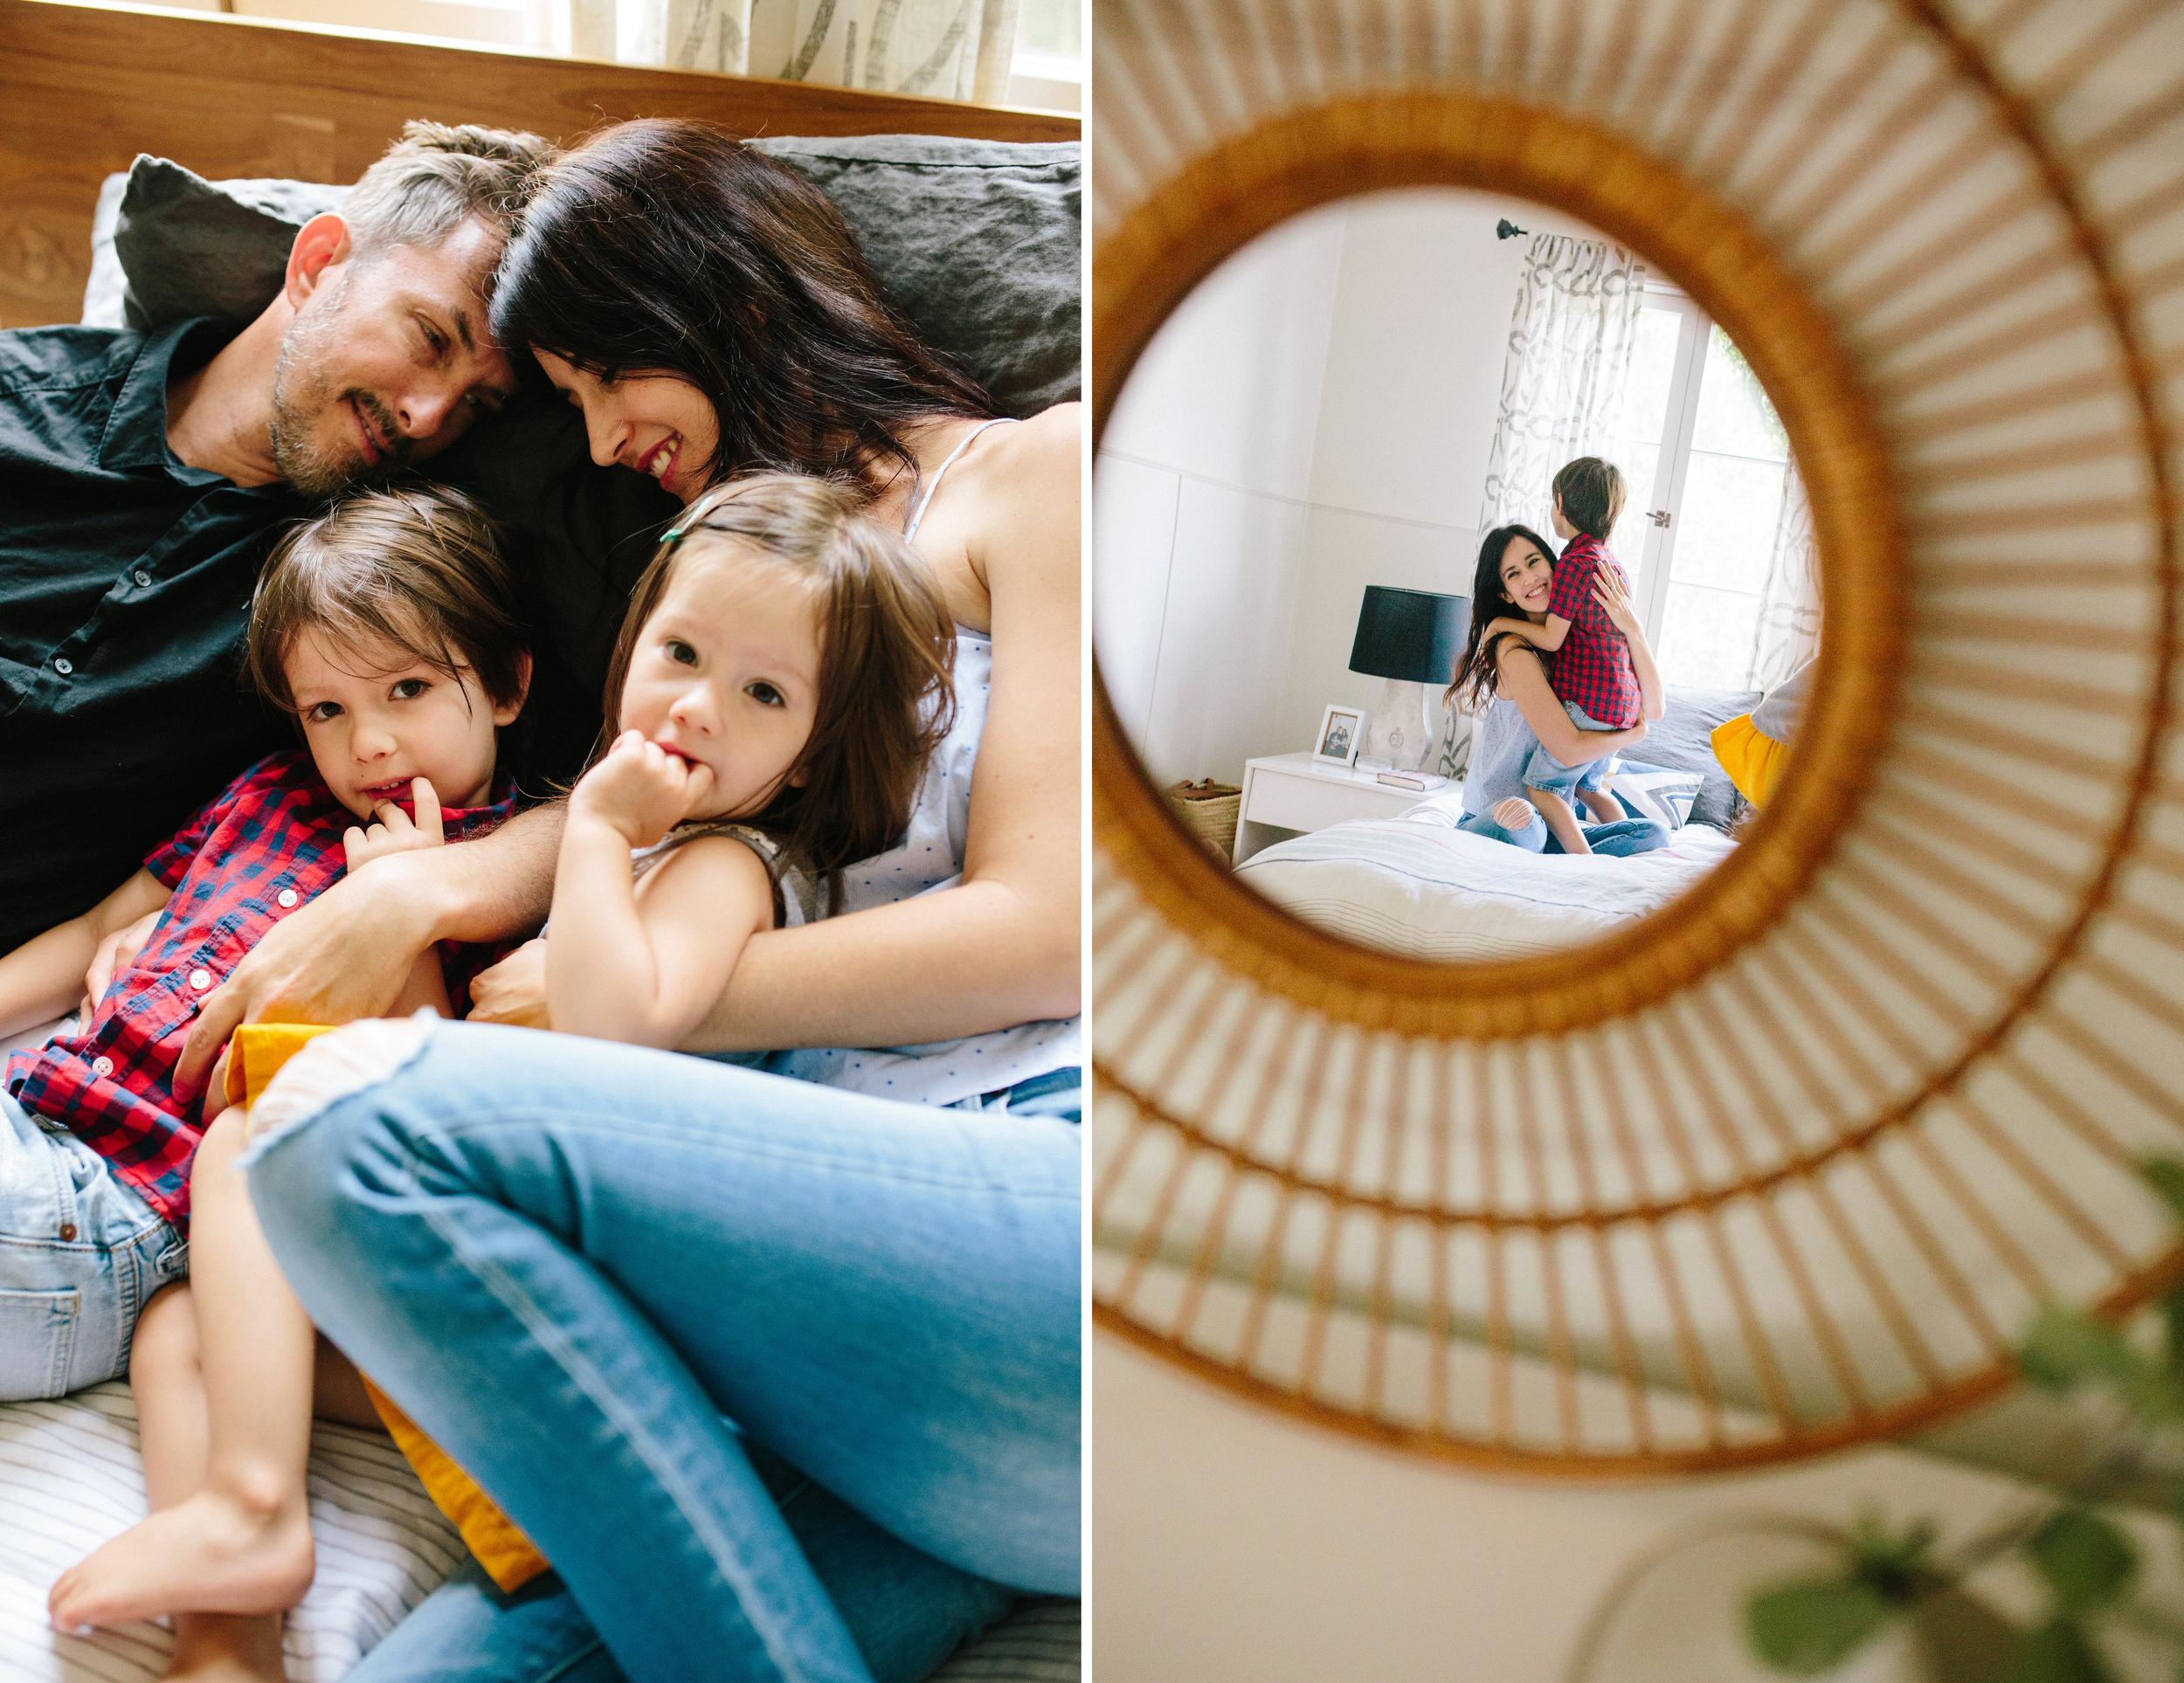 los-angeles-lifestyle-family-child-kid-baby-photographer_8.jpg